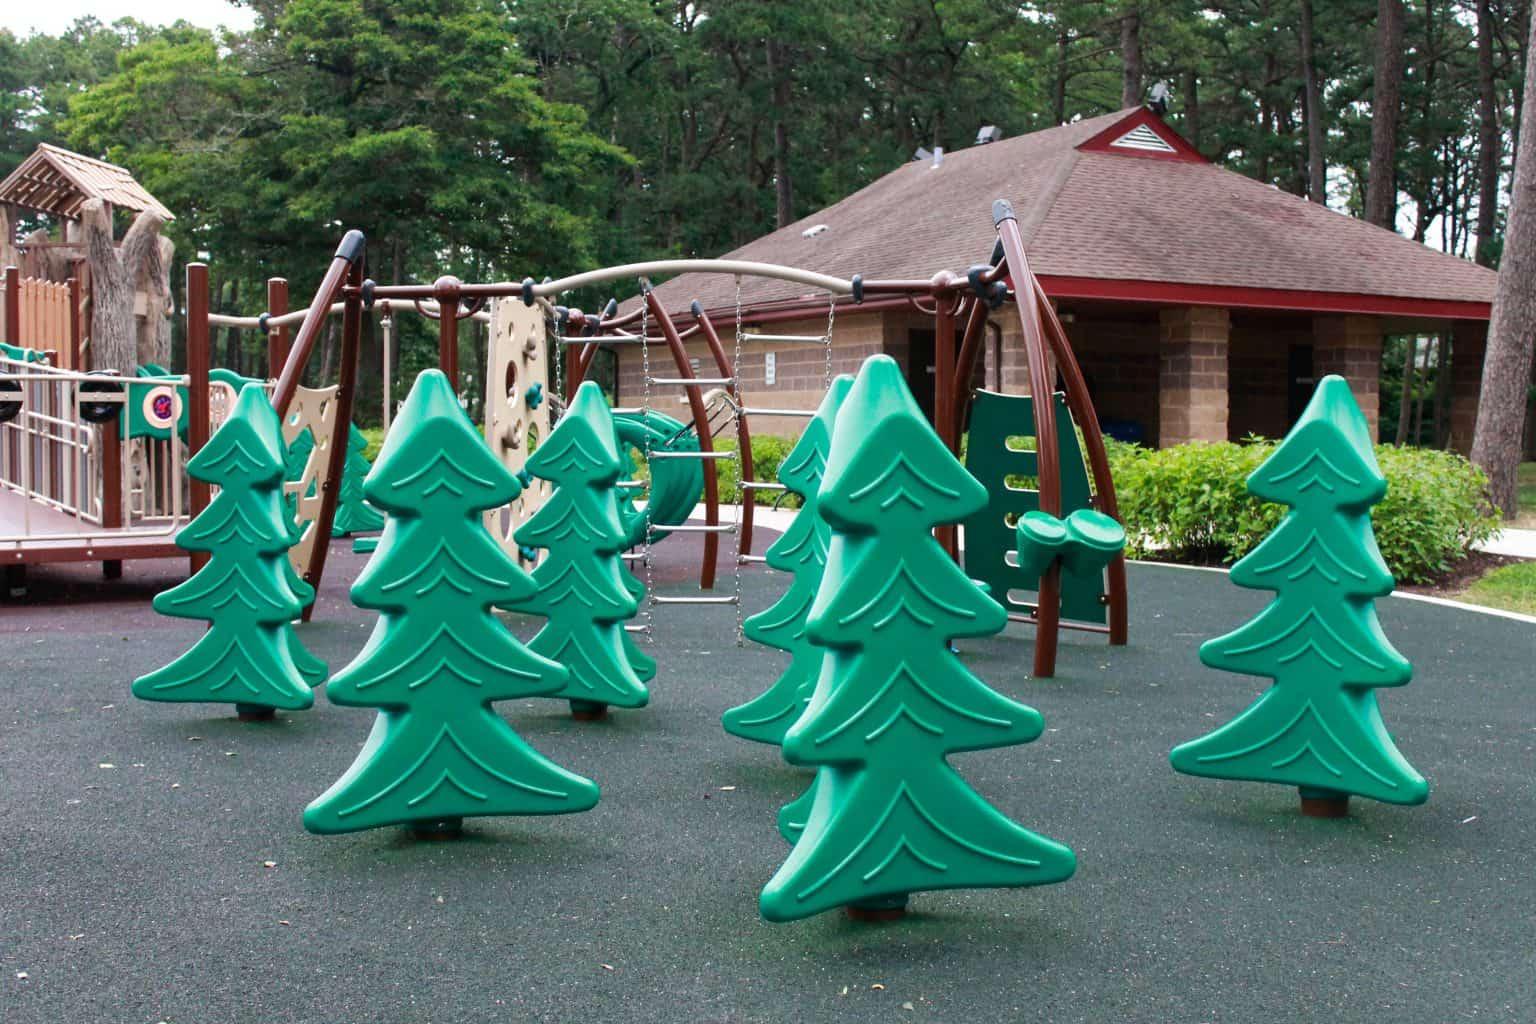 windward-beach-park-playground-brick-nj_27651422253_o-1-1536x1024